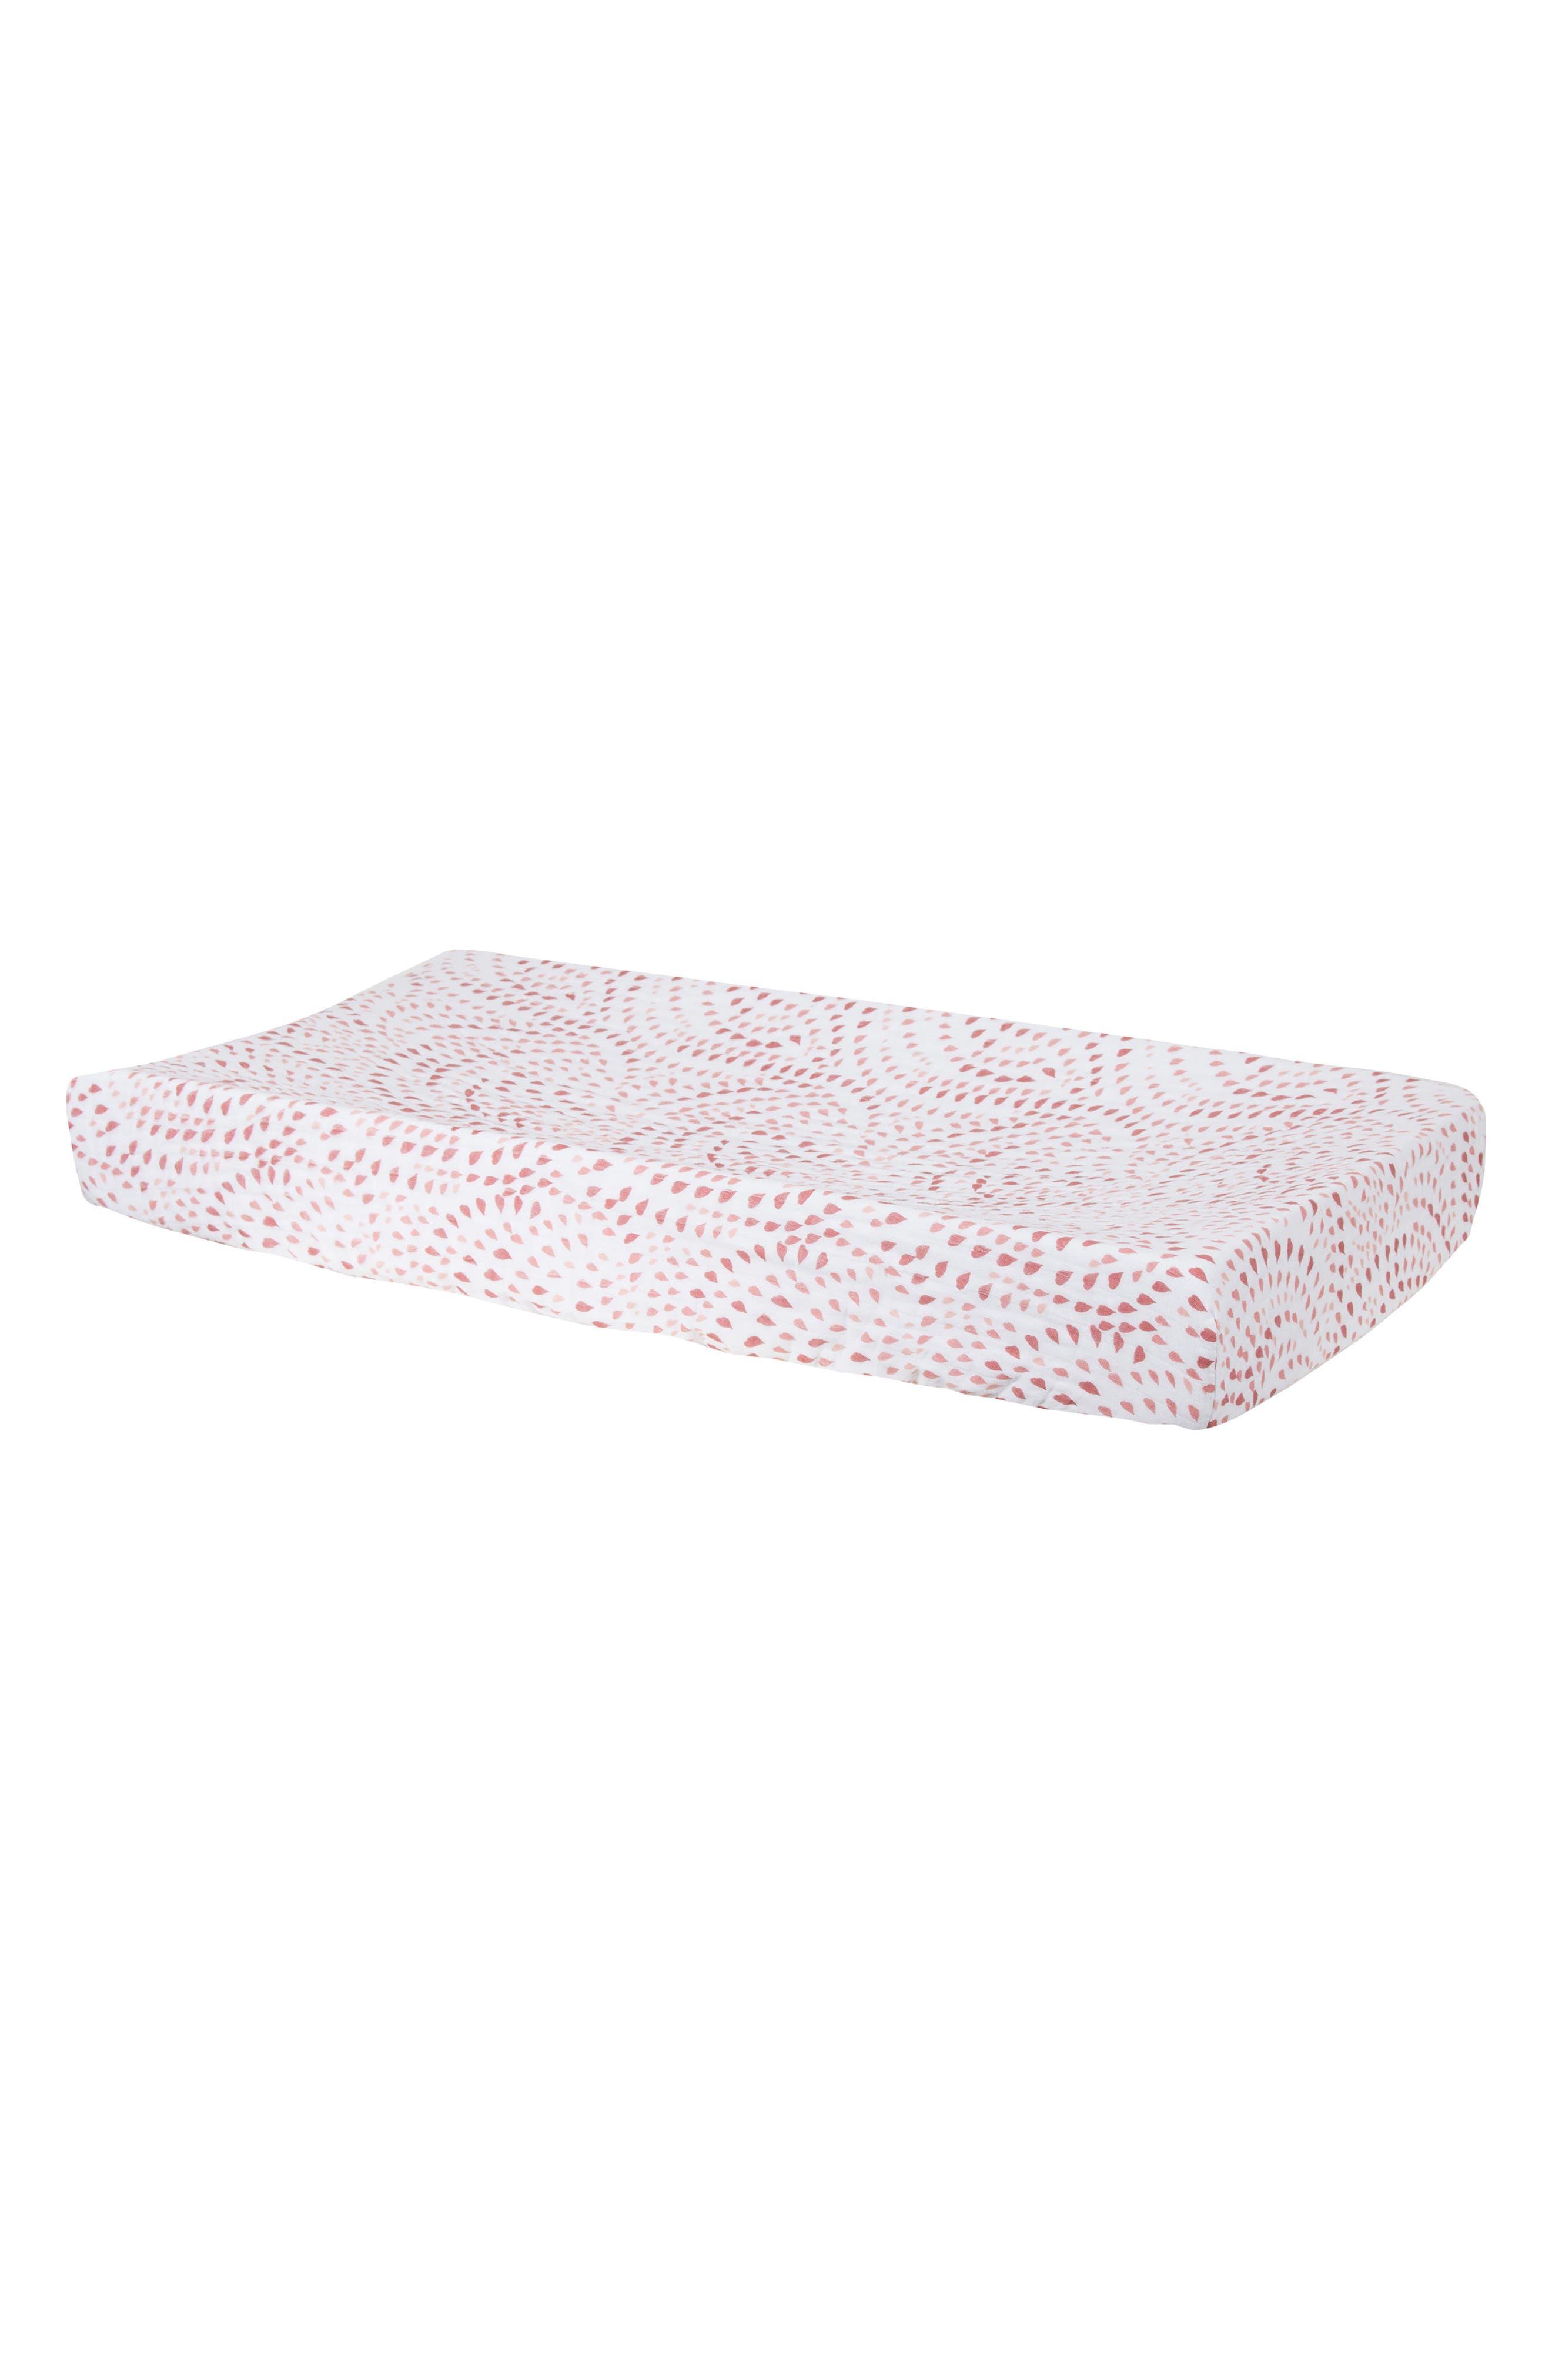 Muslin Crib Sheet,                         Main,                         color, Rose Quartz